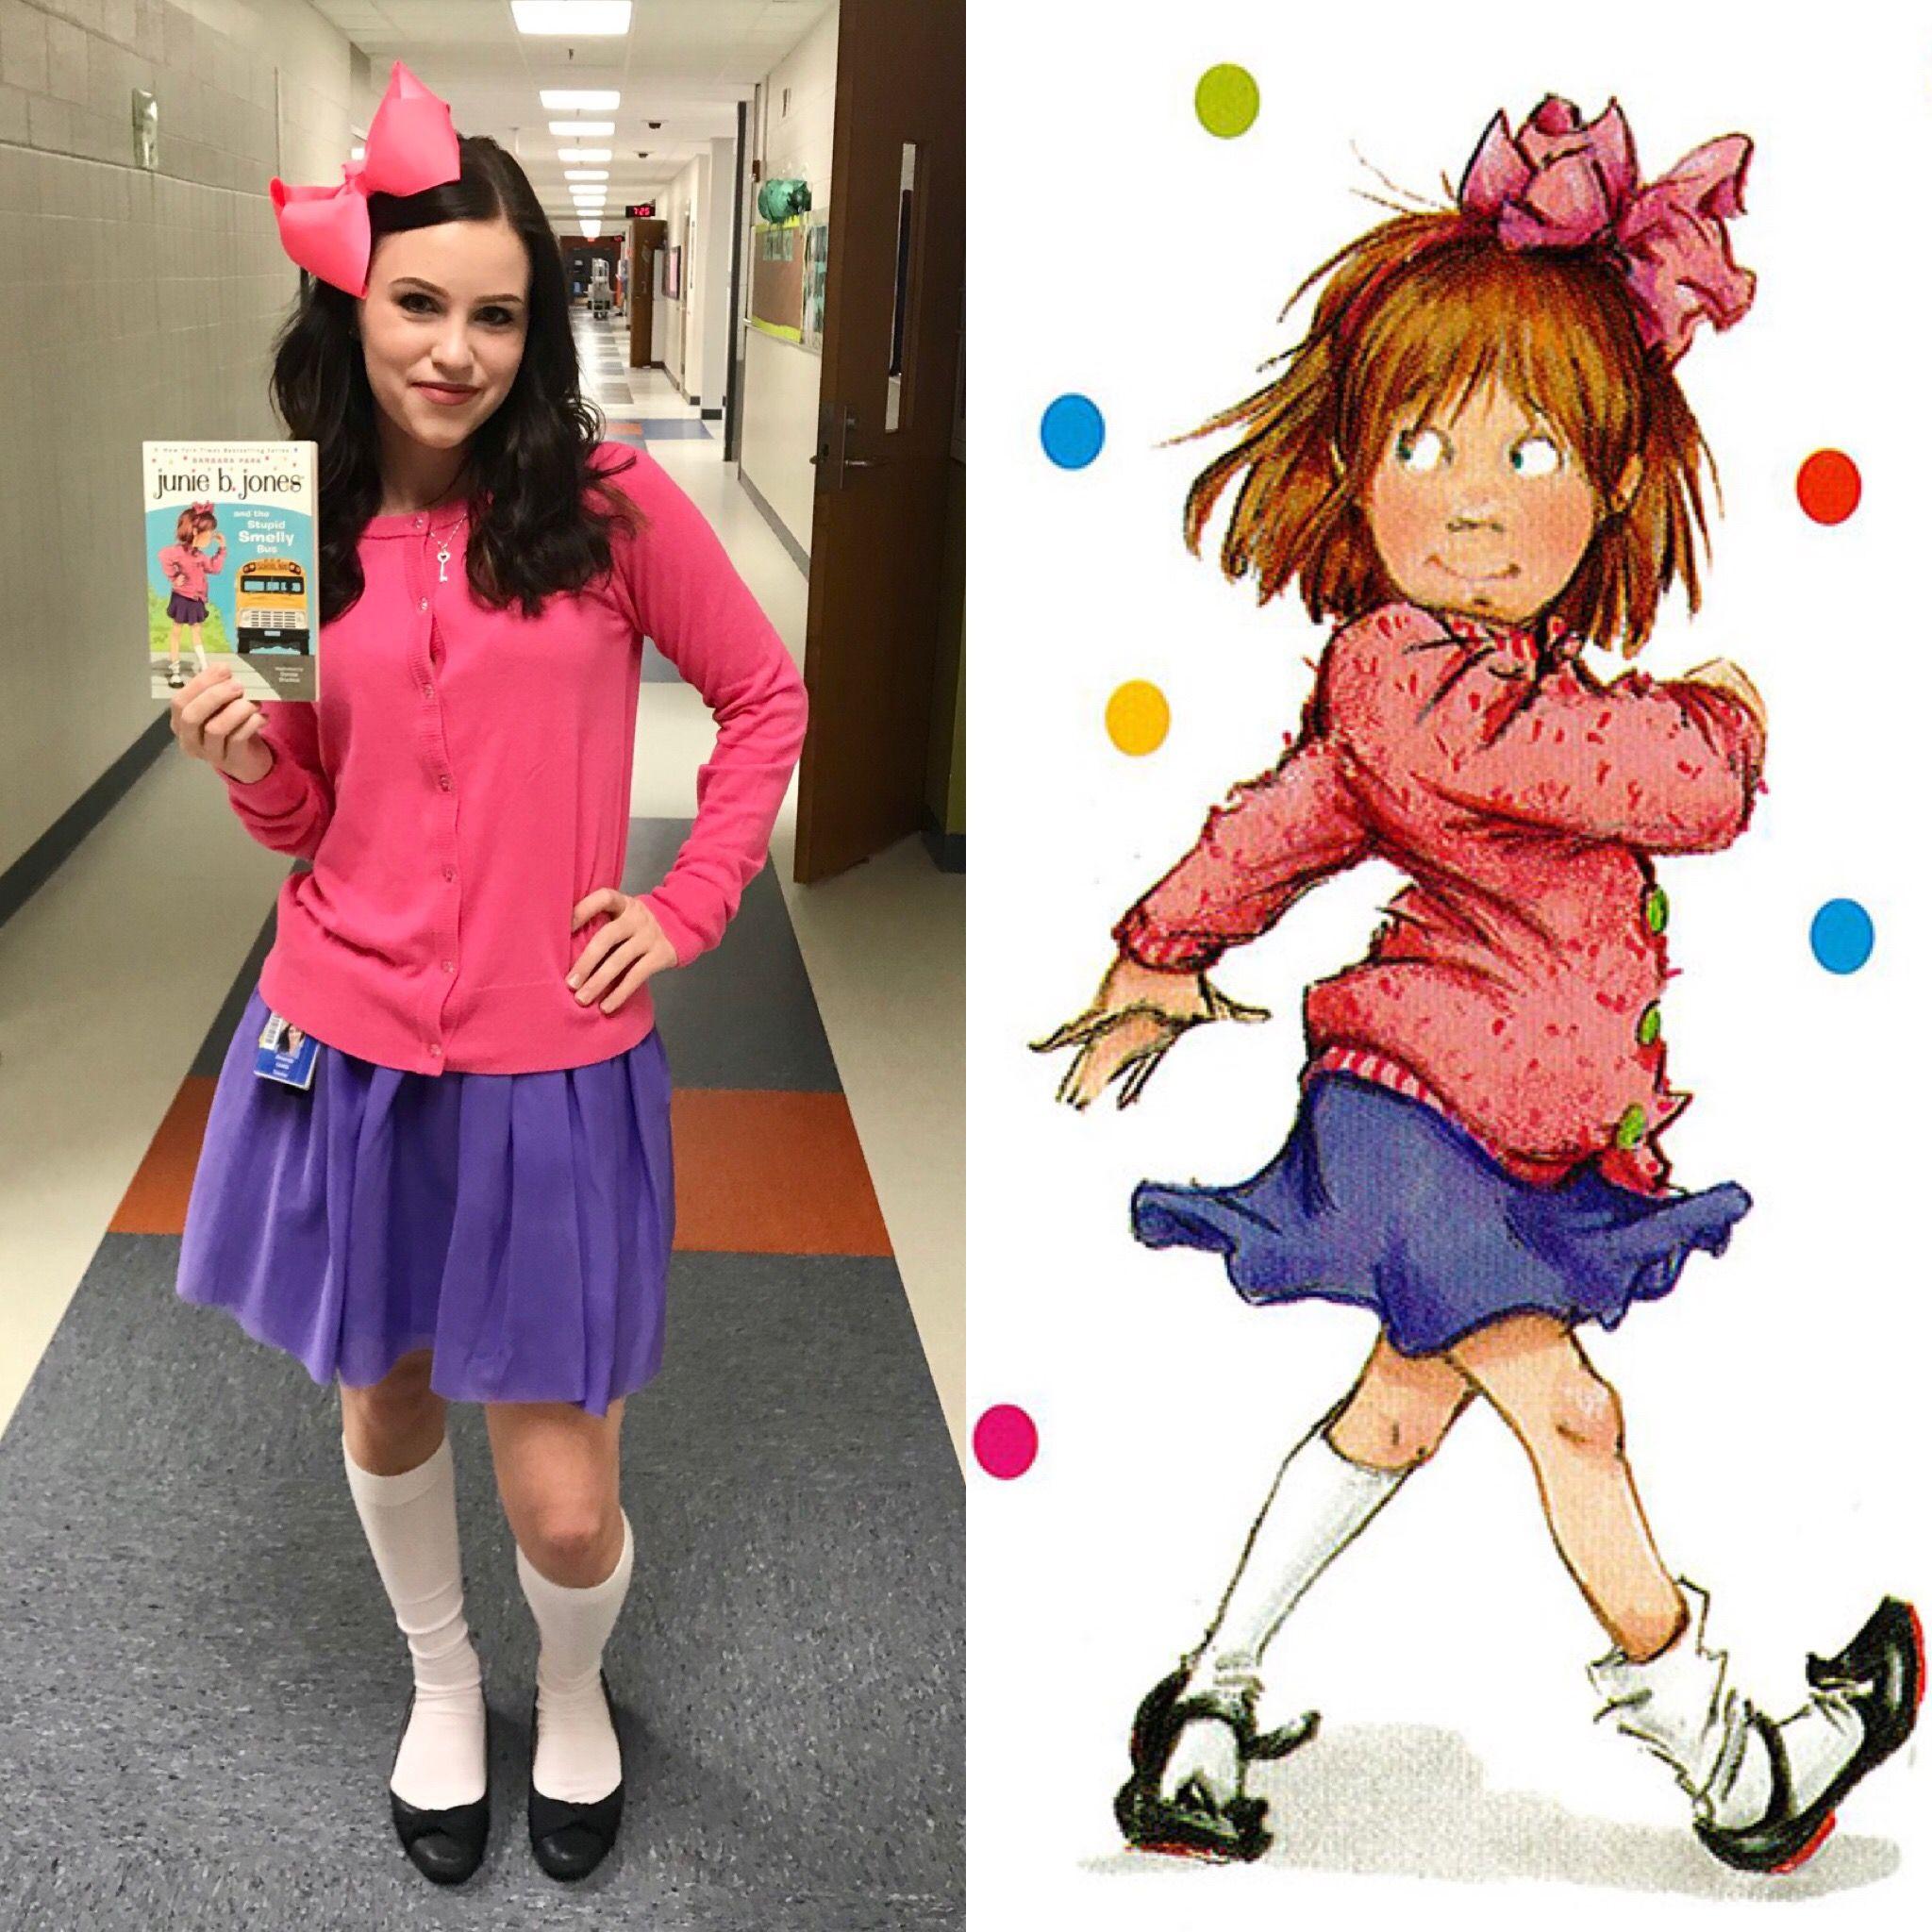 Junior B Jones Book Character Costume Book Character Costumes Kids Book Character Costumes Childrens Book Character Costumes